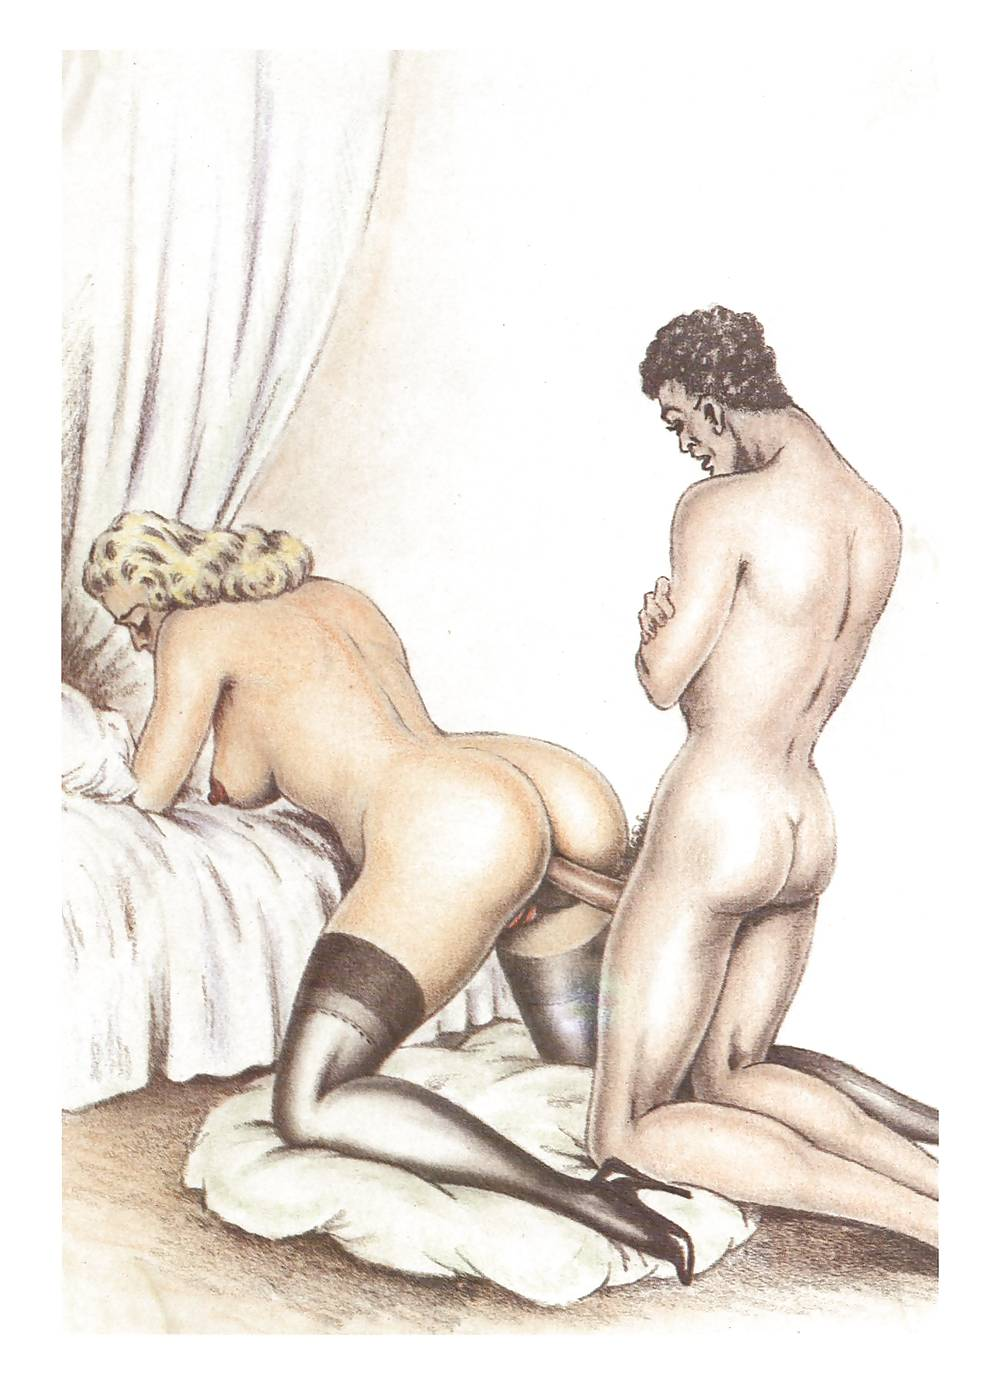 Erotic Vintage drawings Porn Pics #295837